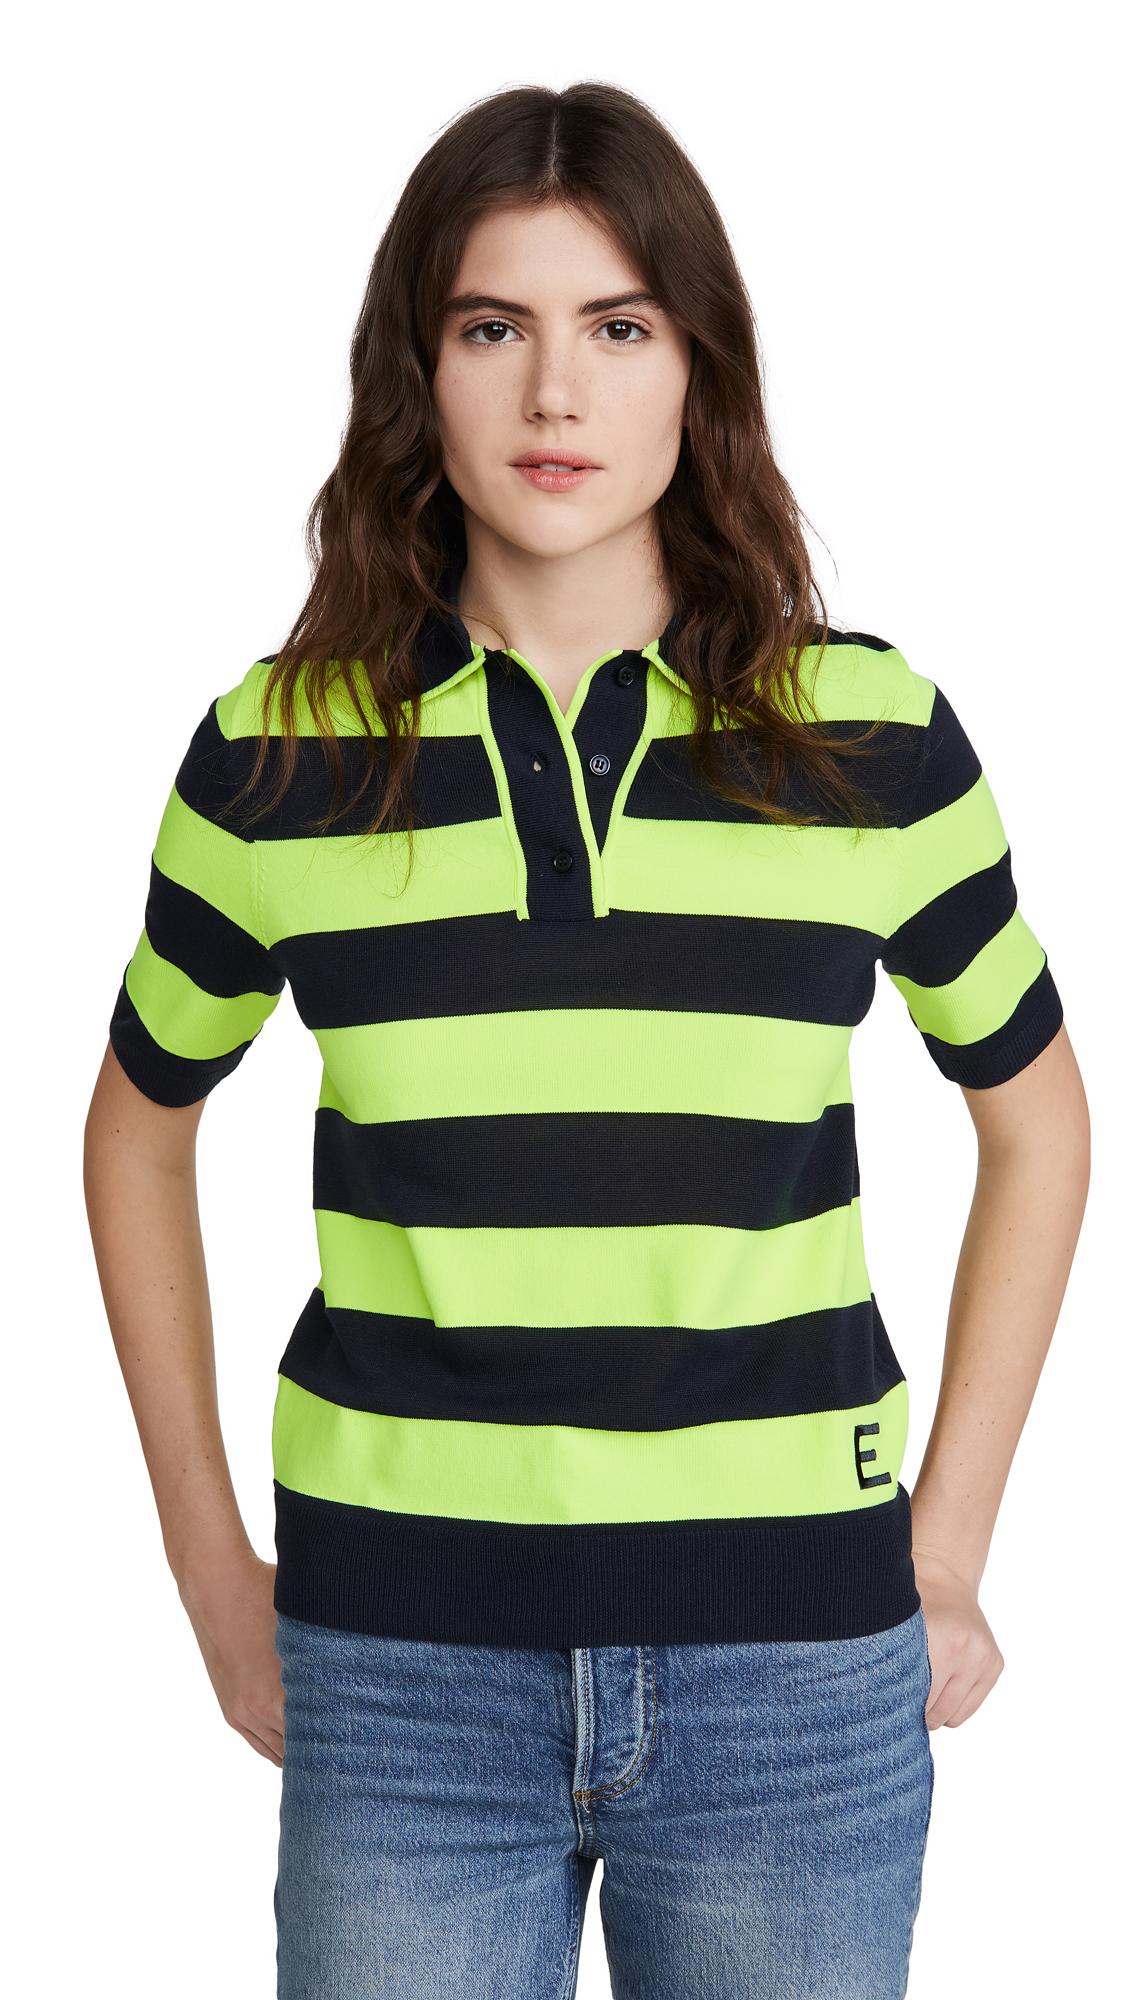 Essentiel Antwerp Vailhan Fluo Striped Polo Shirt - 50% Off Sale